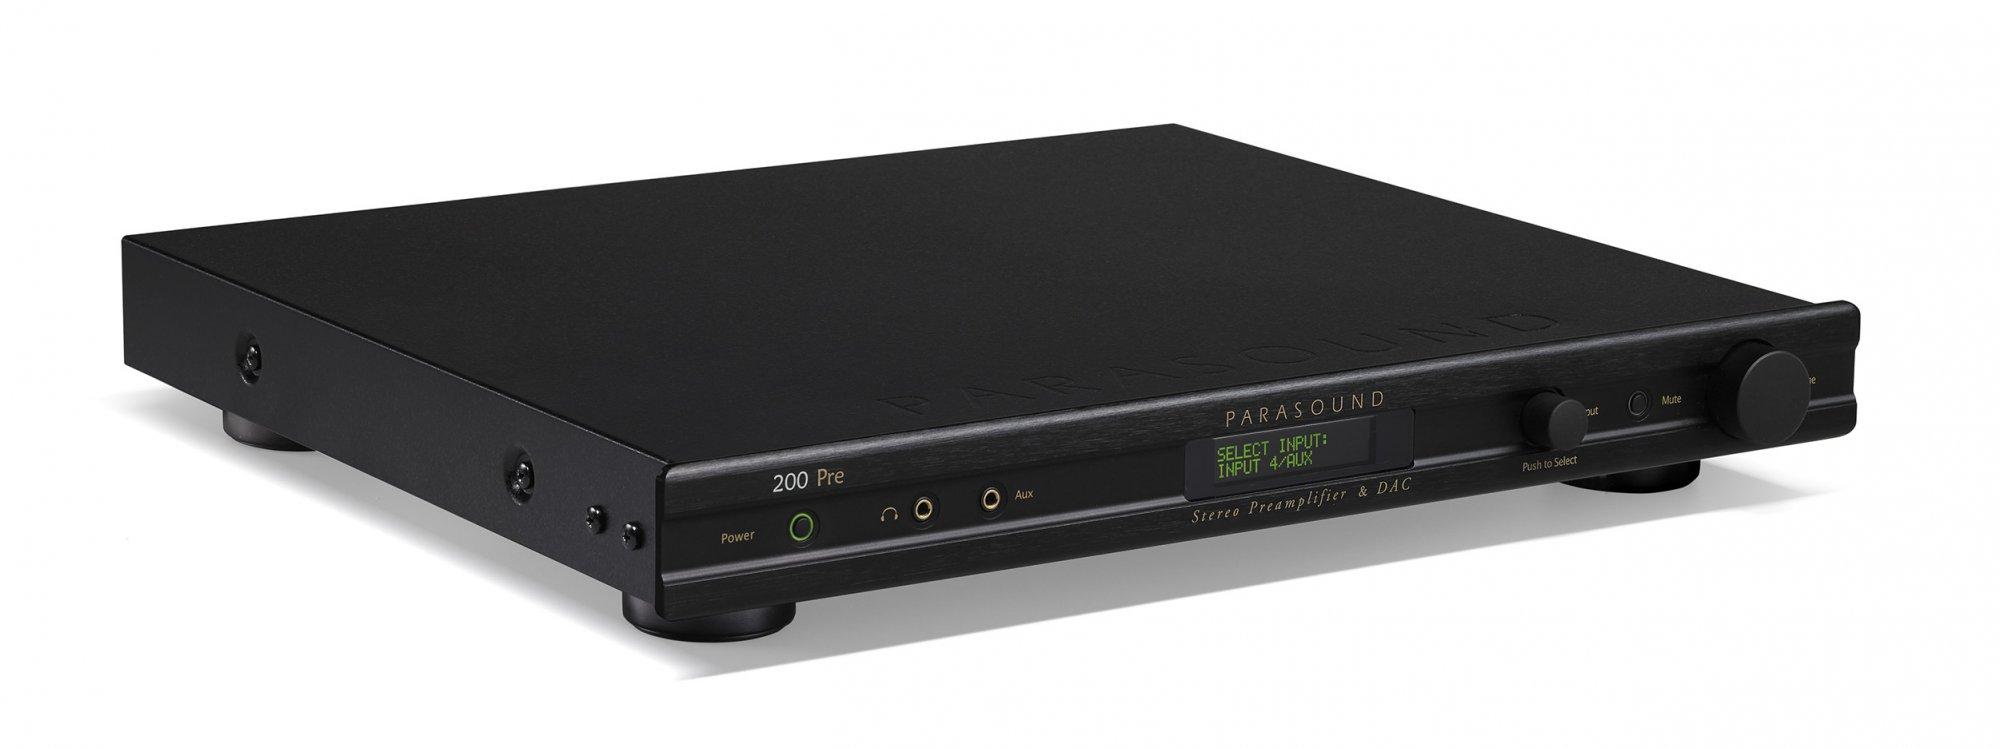 Parasound NewClassic 200 Pre  Stereo Preamplifier & DAC